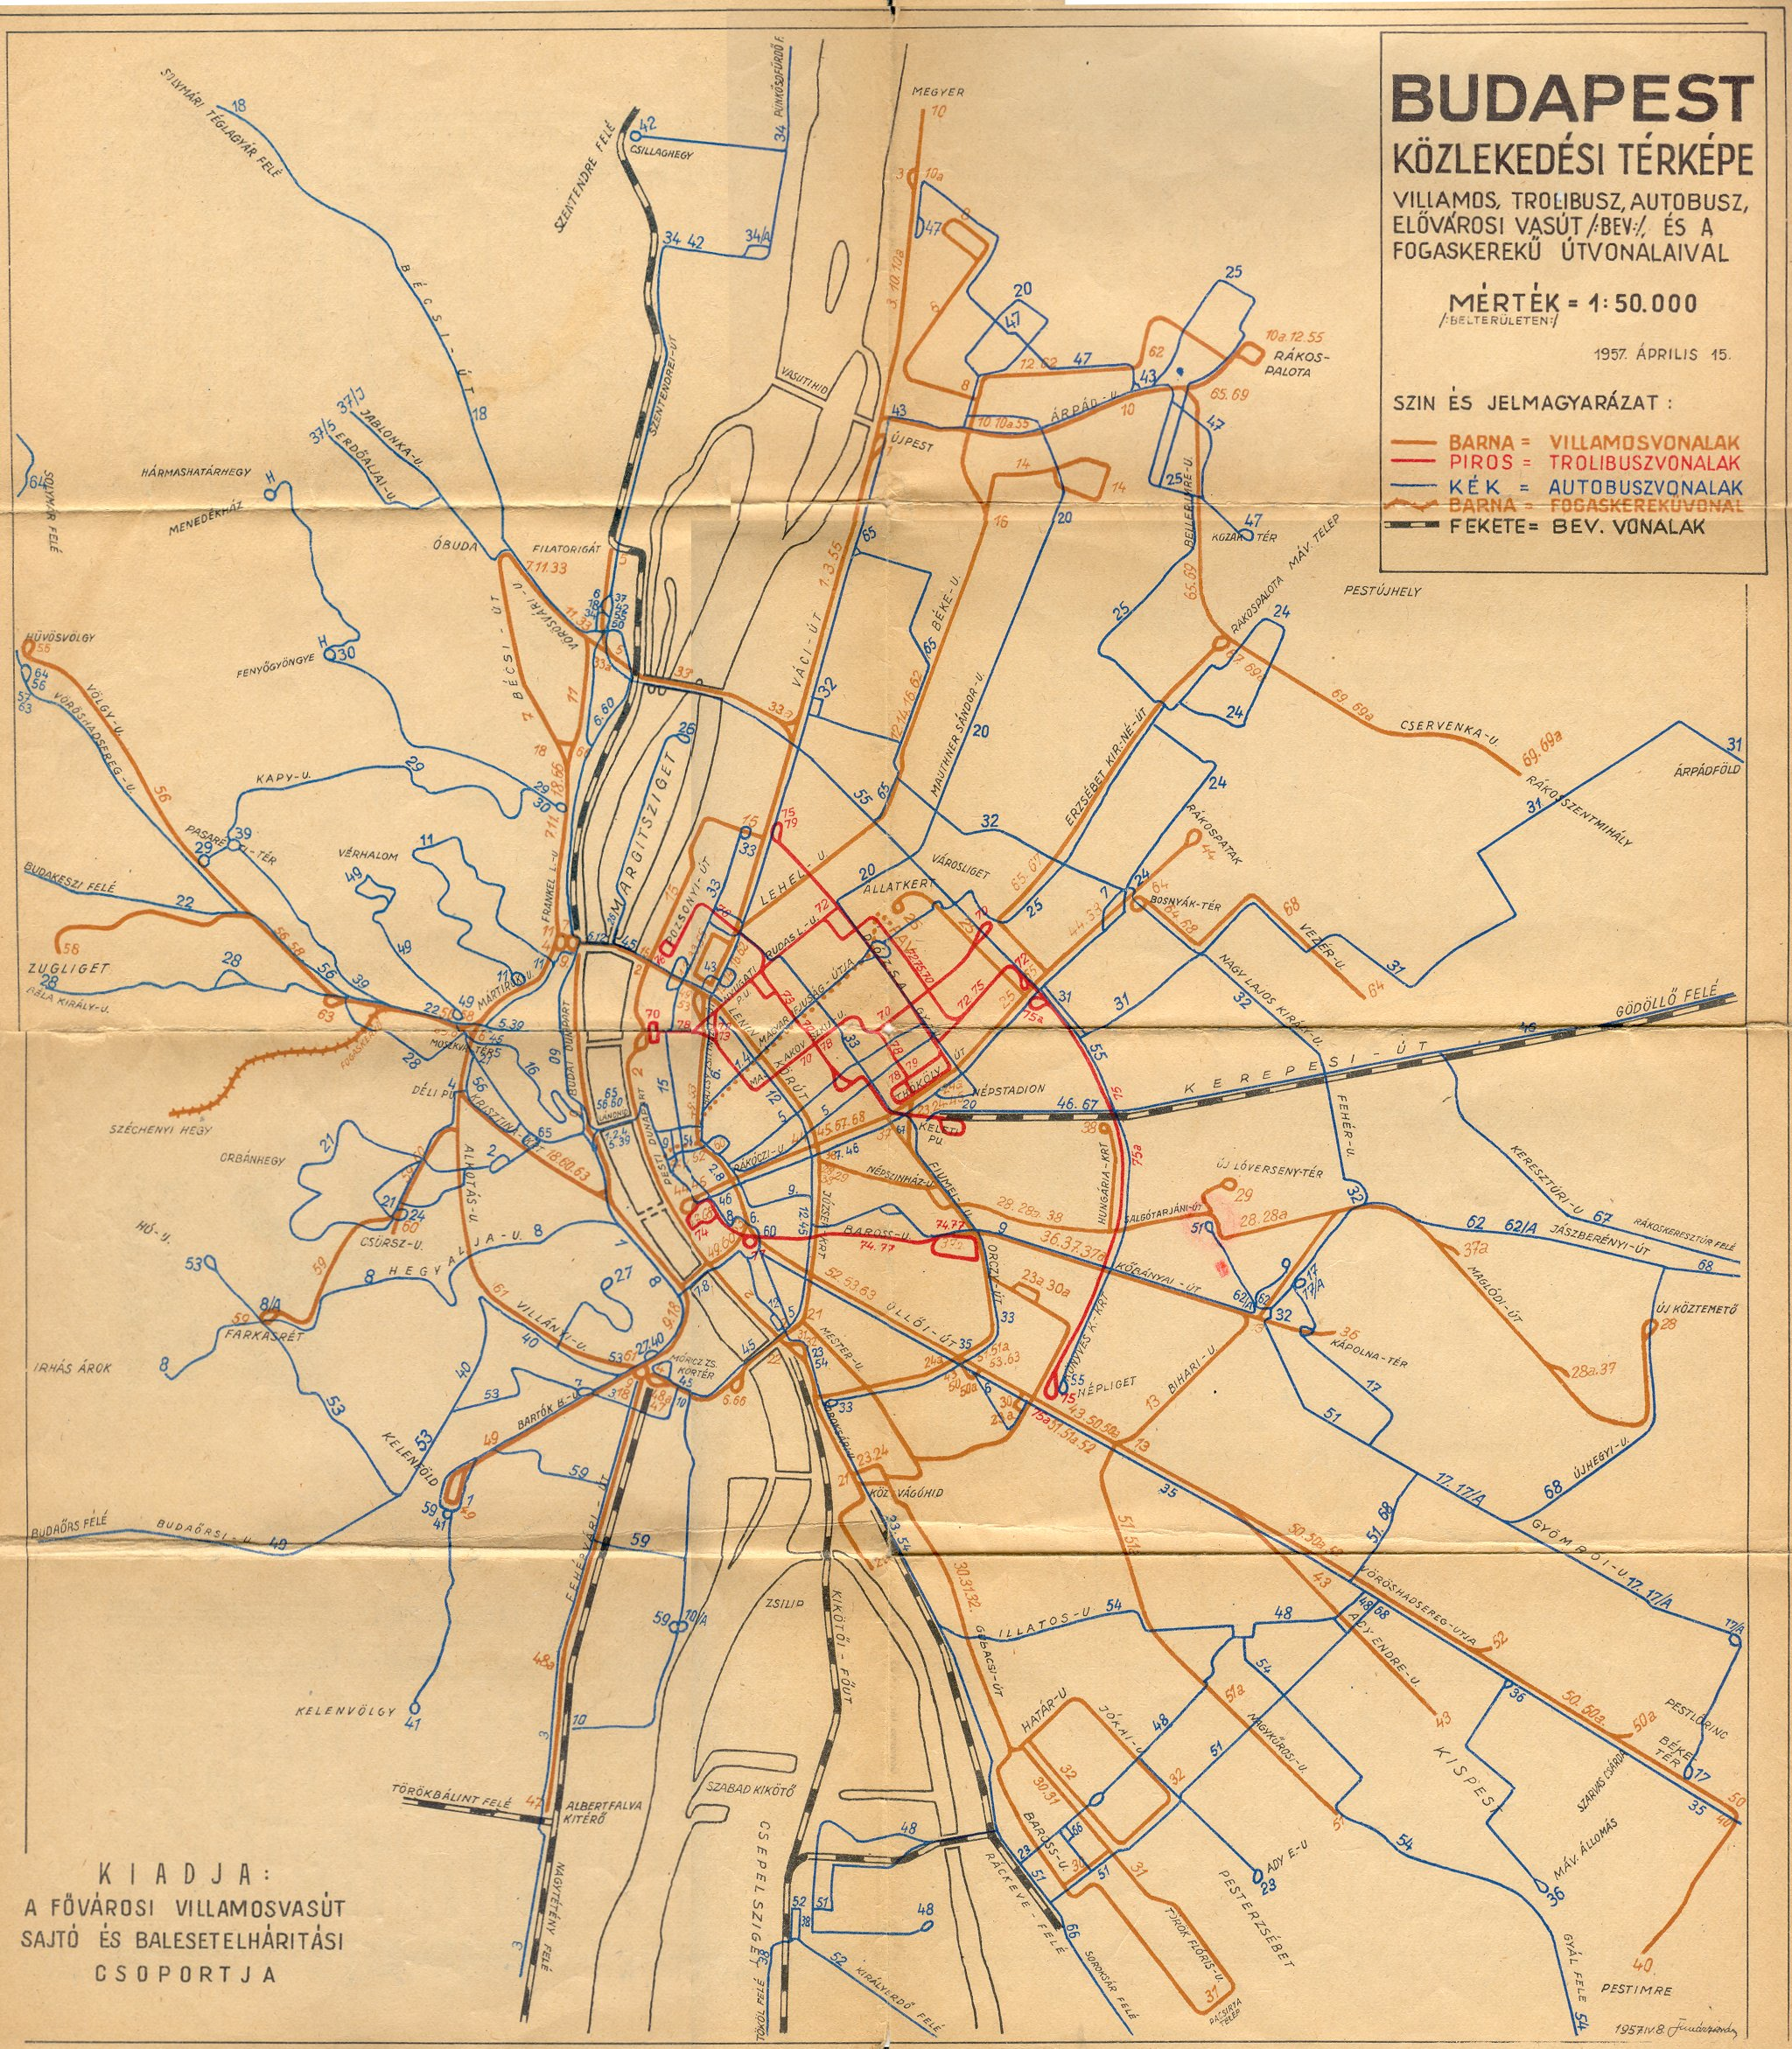 villamos térkép budapest Villamos.Budapest.Hu   Budapest Közlekedési Térképe 1957. villamos térkép budapest